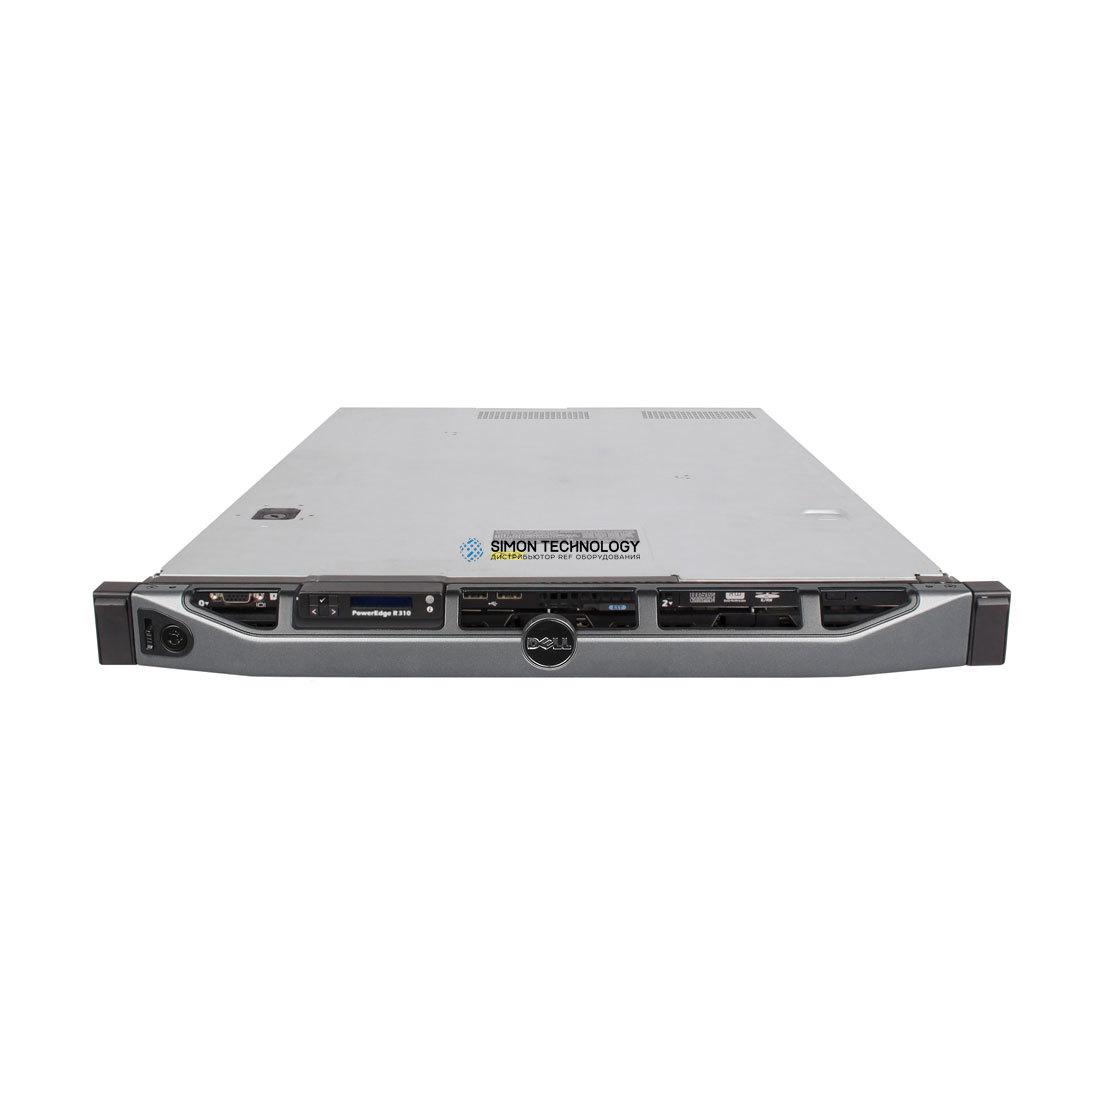 Сервер Dell PER310 1*X3450 4GB PERC 6/I 4LFF NHP DVD (PER310 X3450)